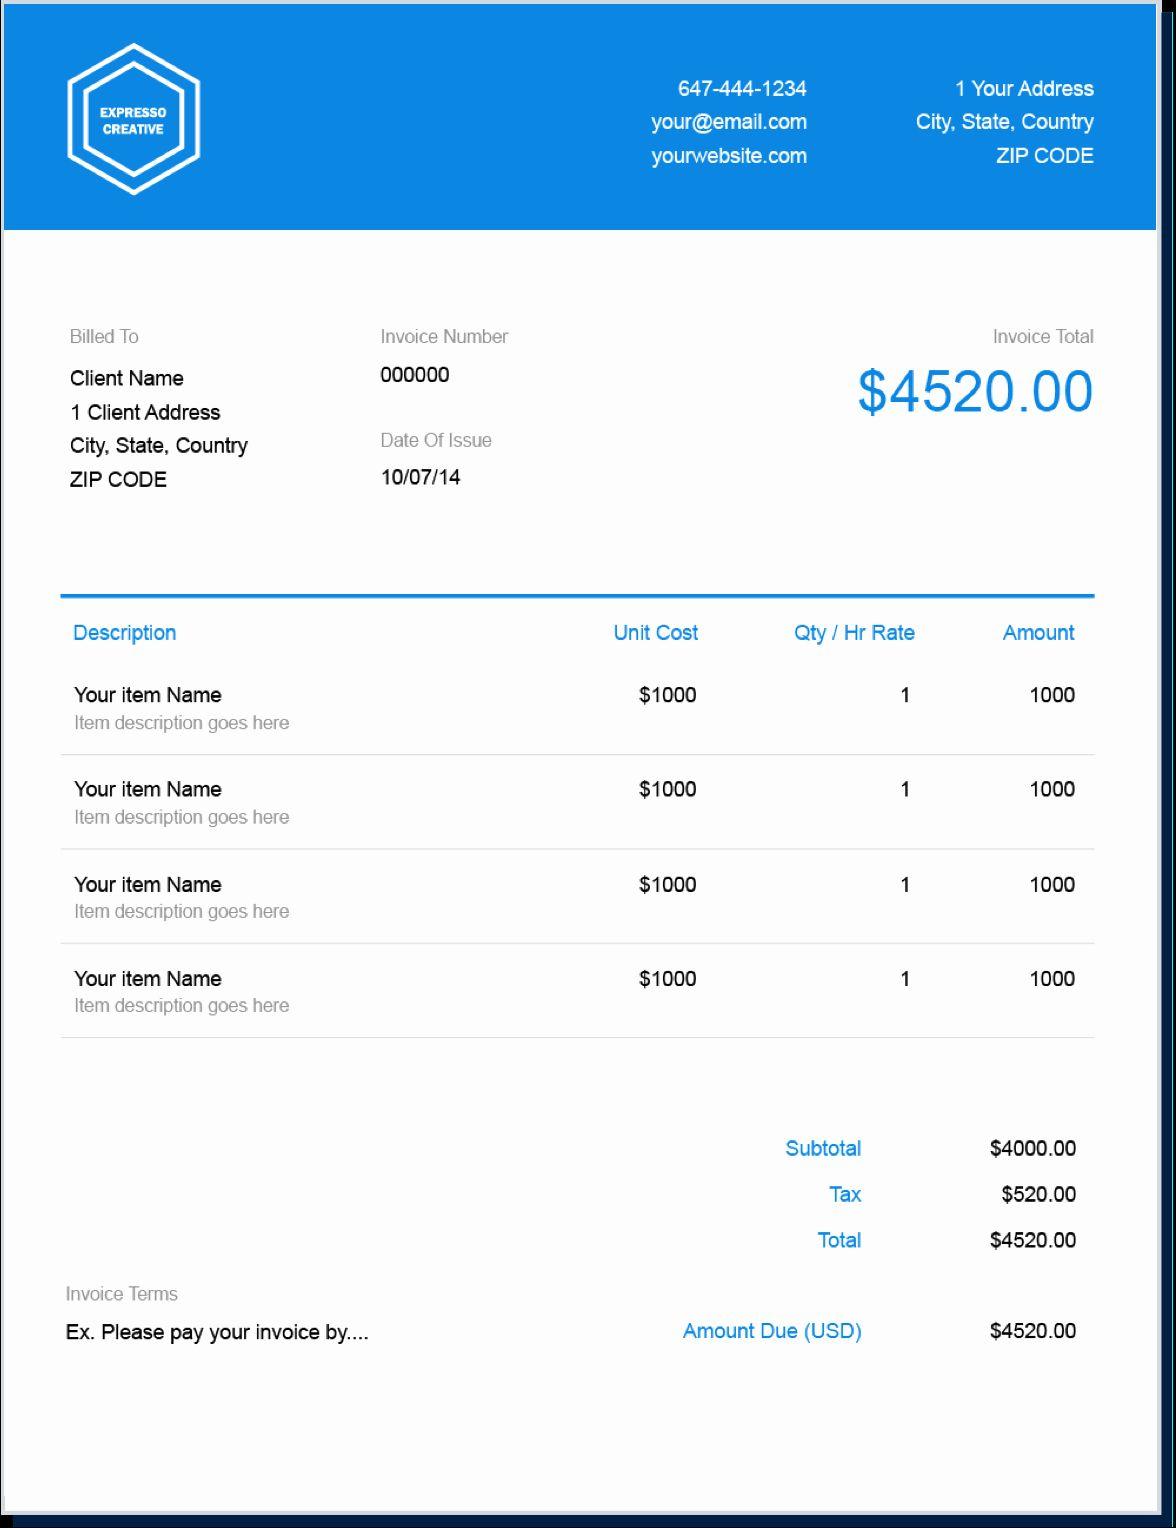 Billing Invoice Template Free Elegant Invoice Template Send In Minutes Invoice Template Photography Invoice Template Invoice Template Word